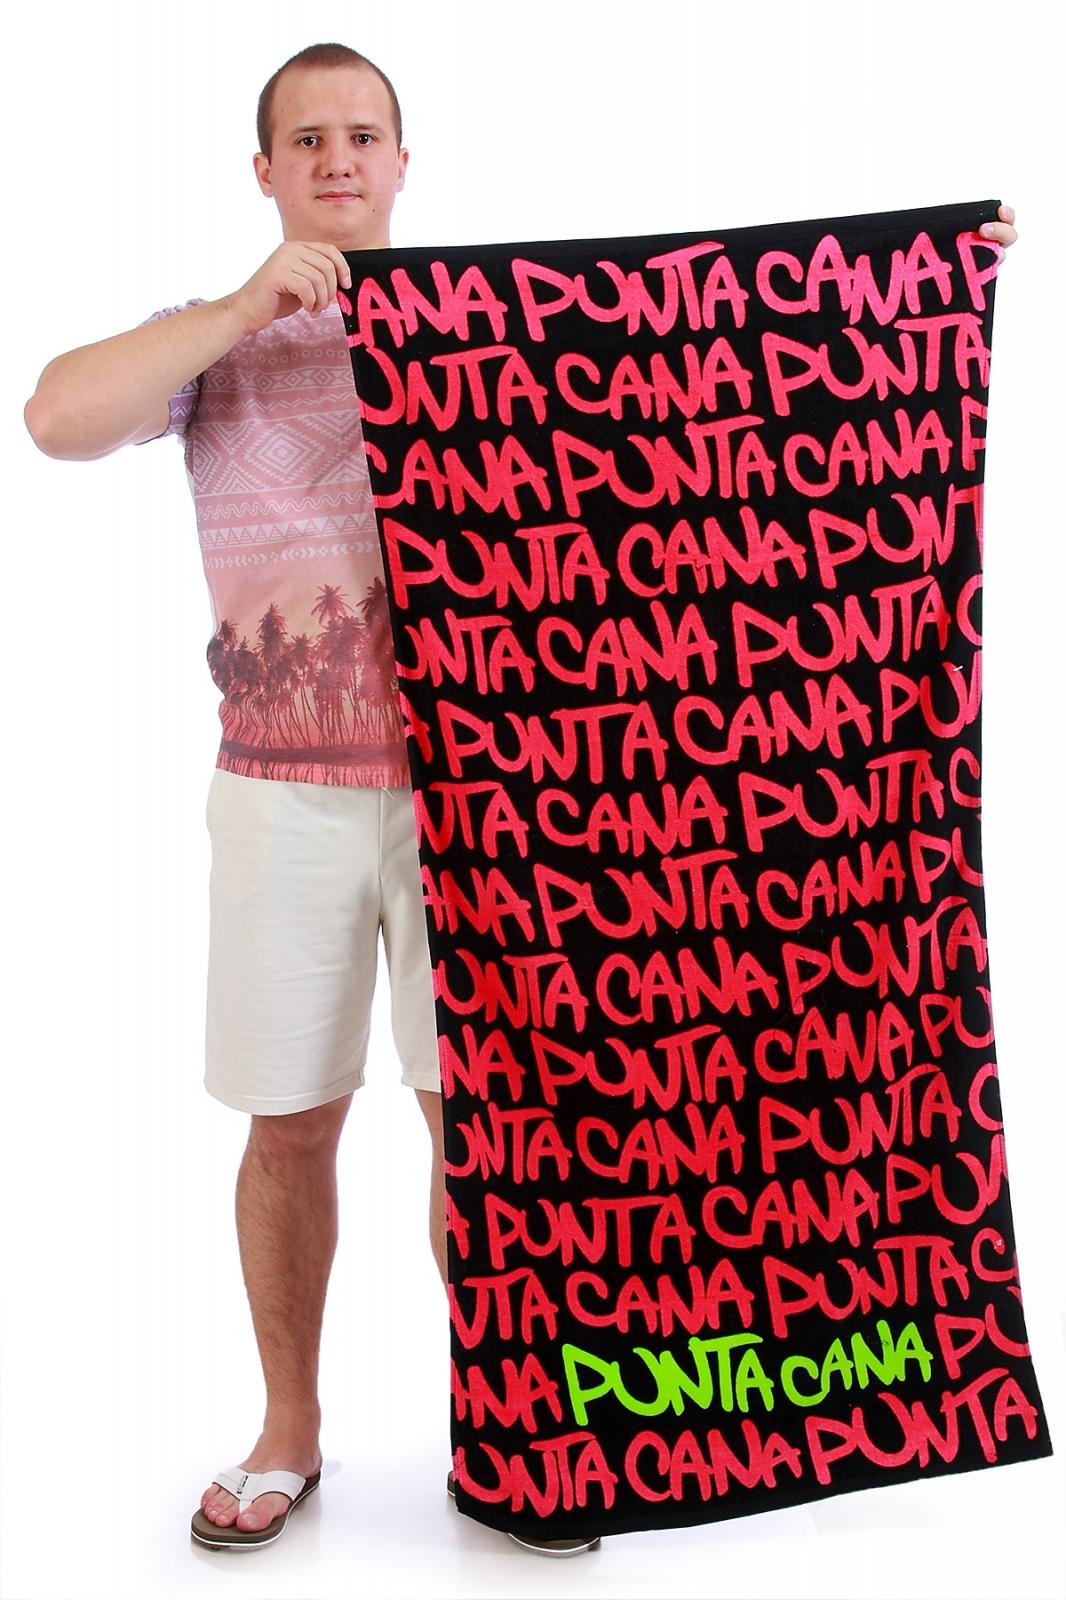 Полотенце Пунта Кана - купить с доставкой онлайн